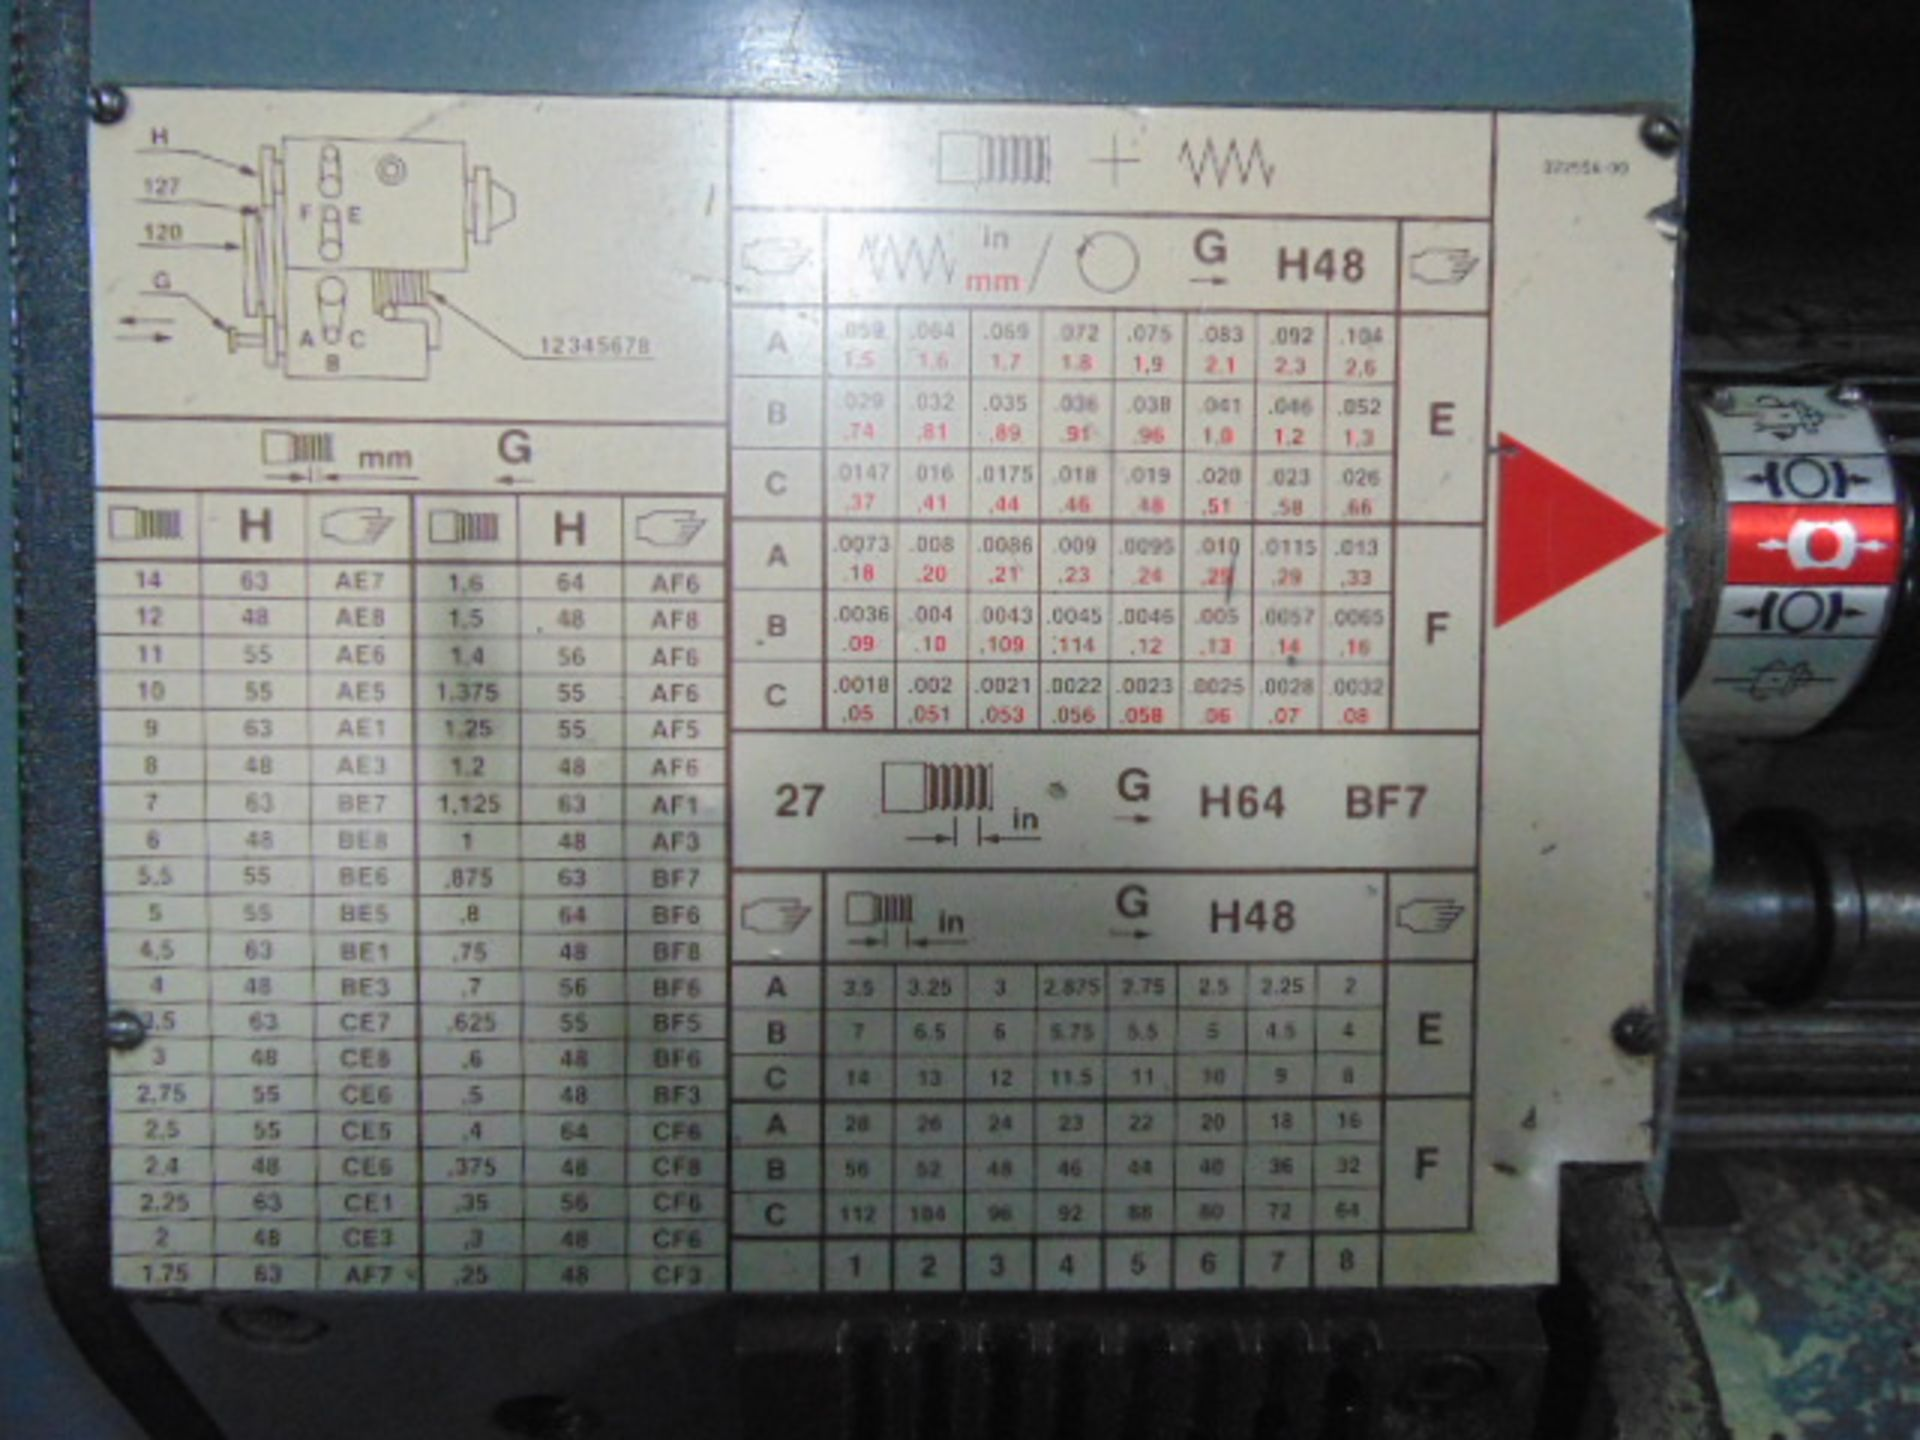 "Lot 40 - ENGINE LATHE, LEBLOND REGAL 19"" X 78"", servo shift headstock, spds: 40-1600 RPM, 3-1/8"" spdl."